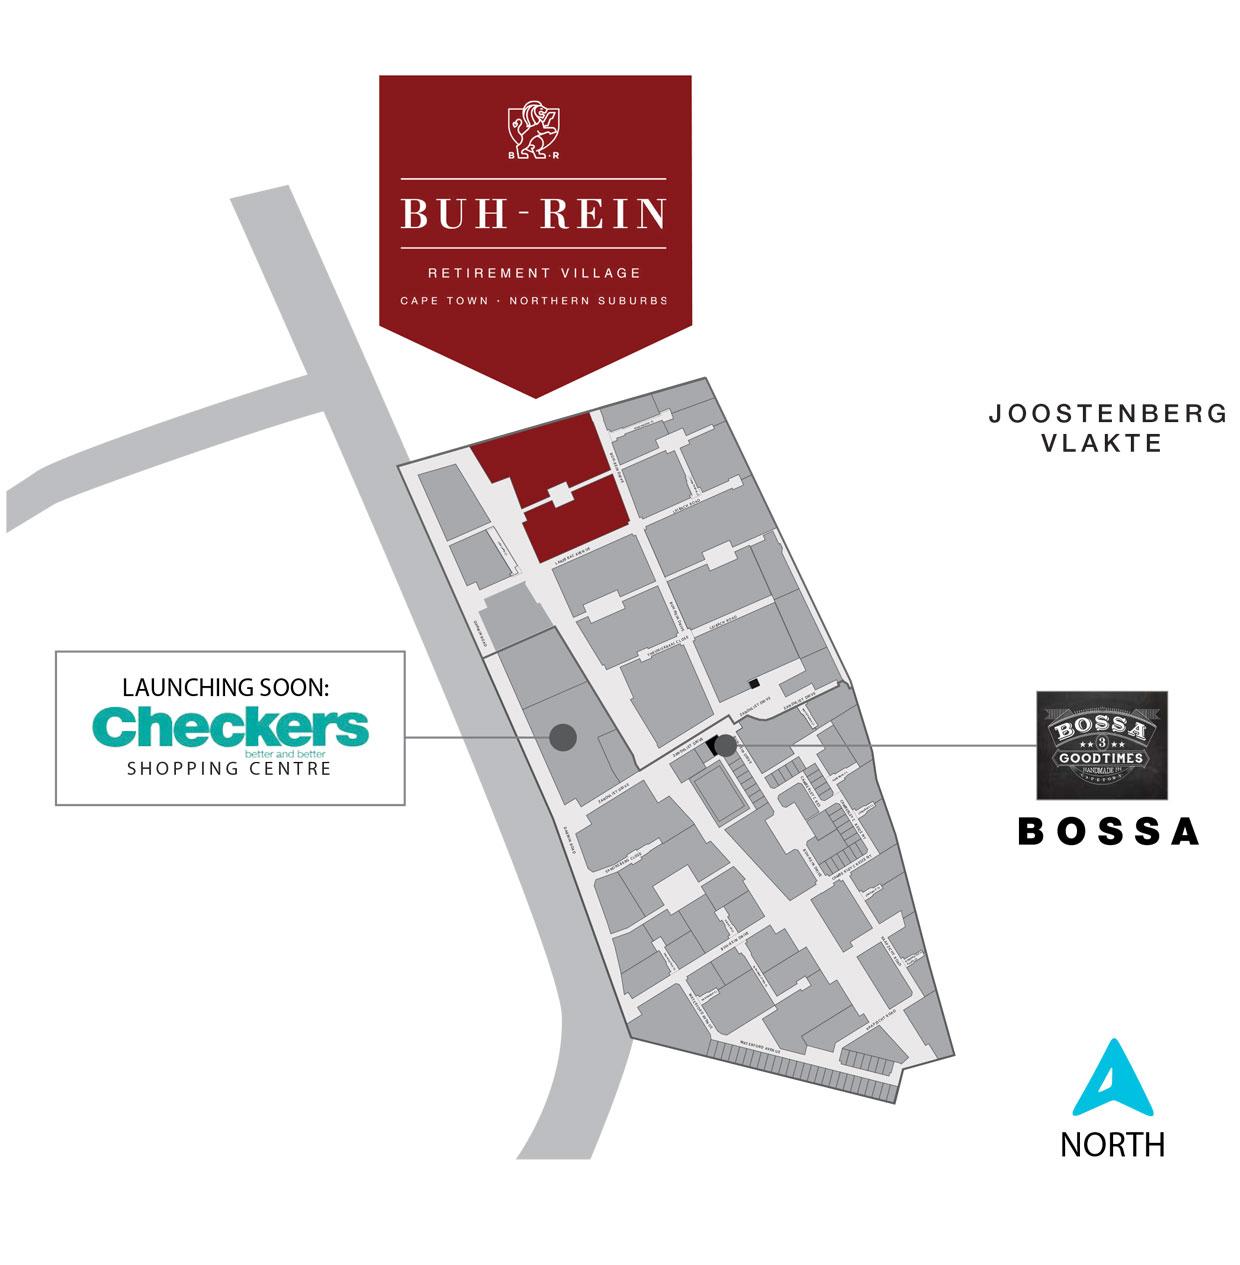 buh-rein-retirement-locality-map